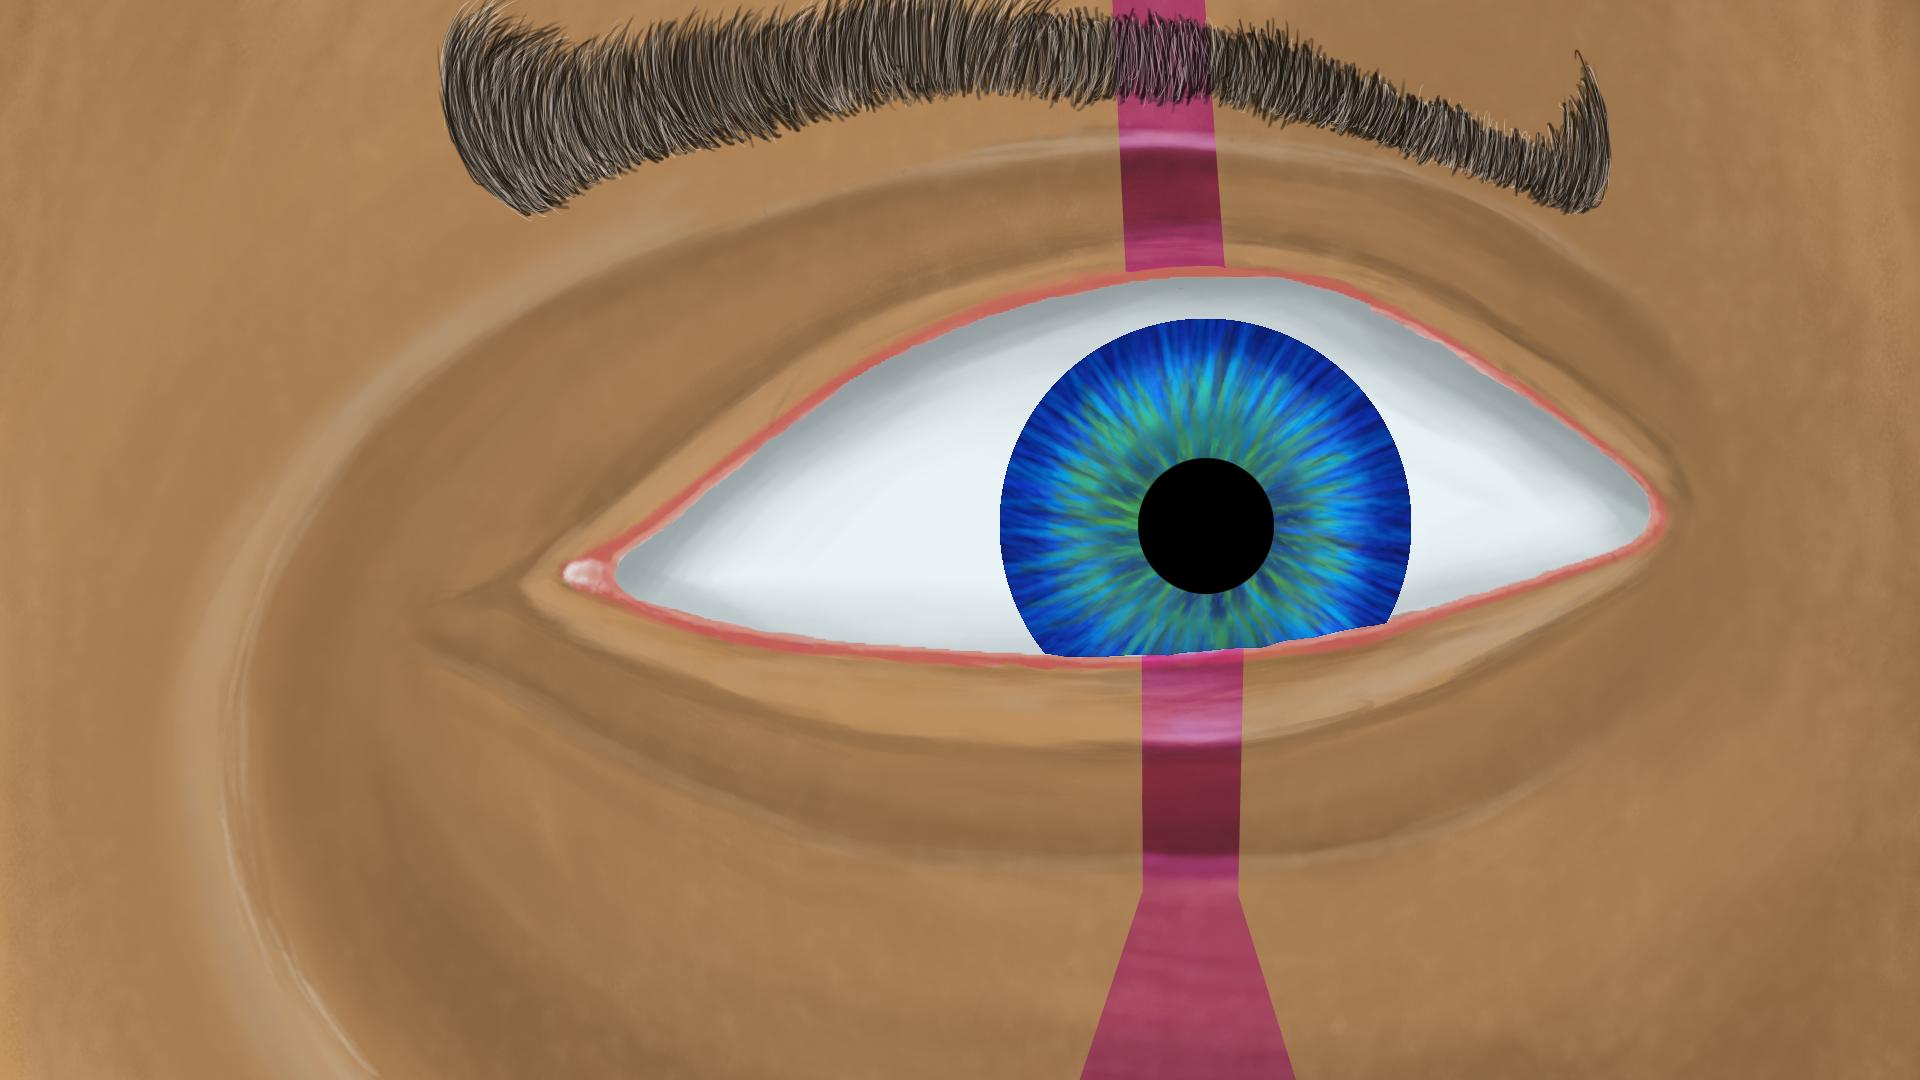 ANA eye - The granny of Overwatch